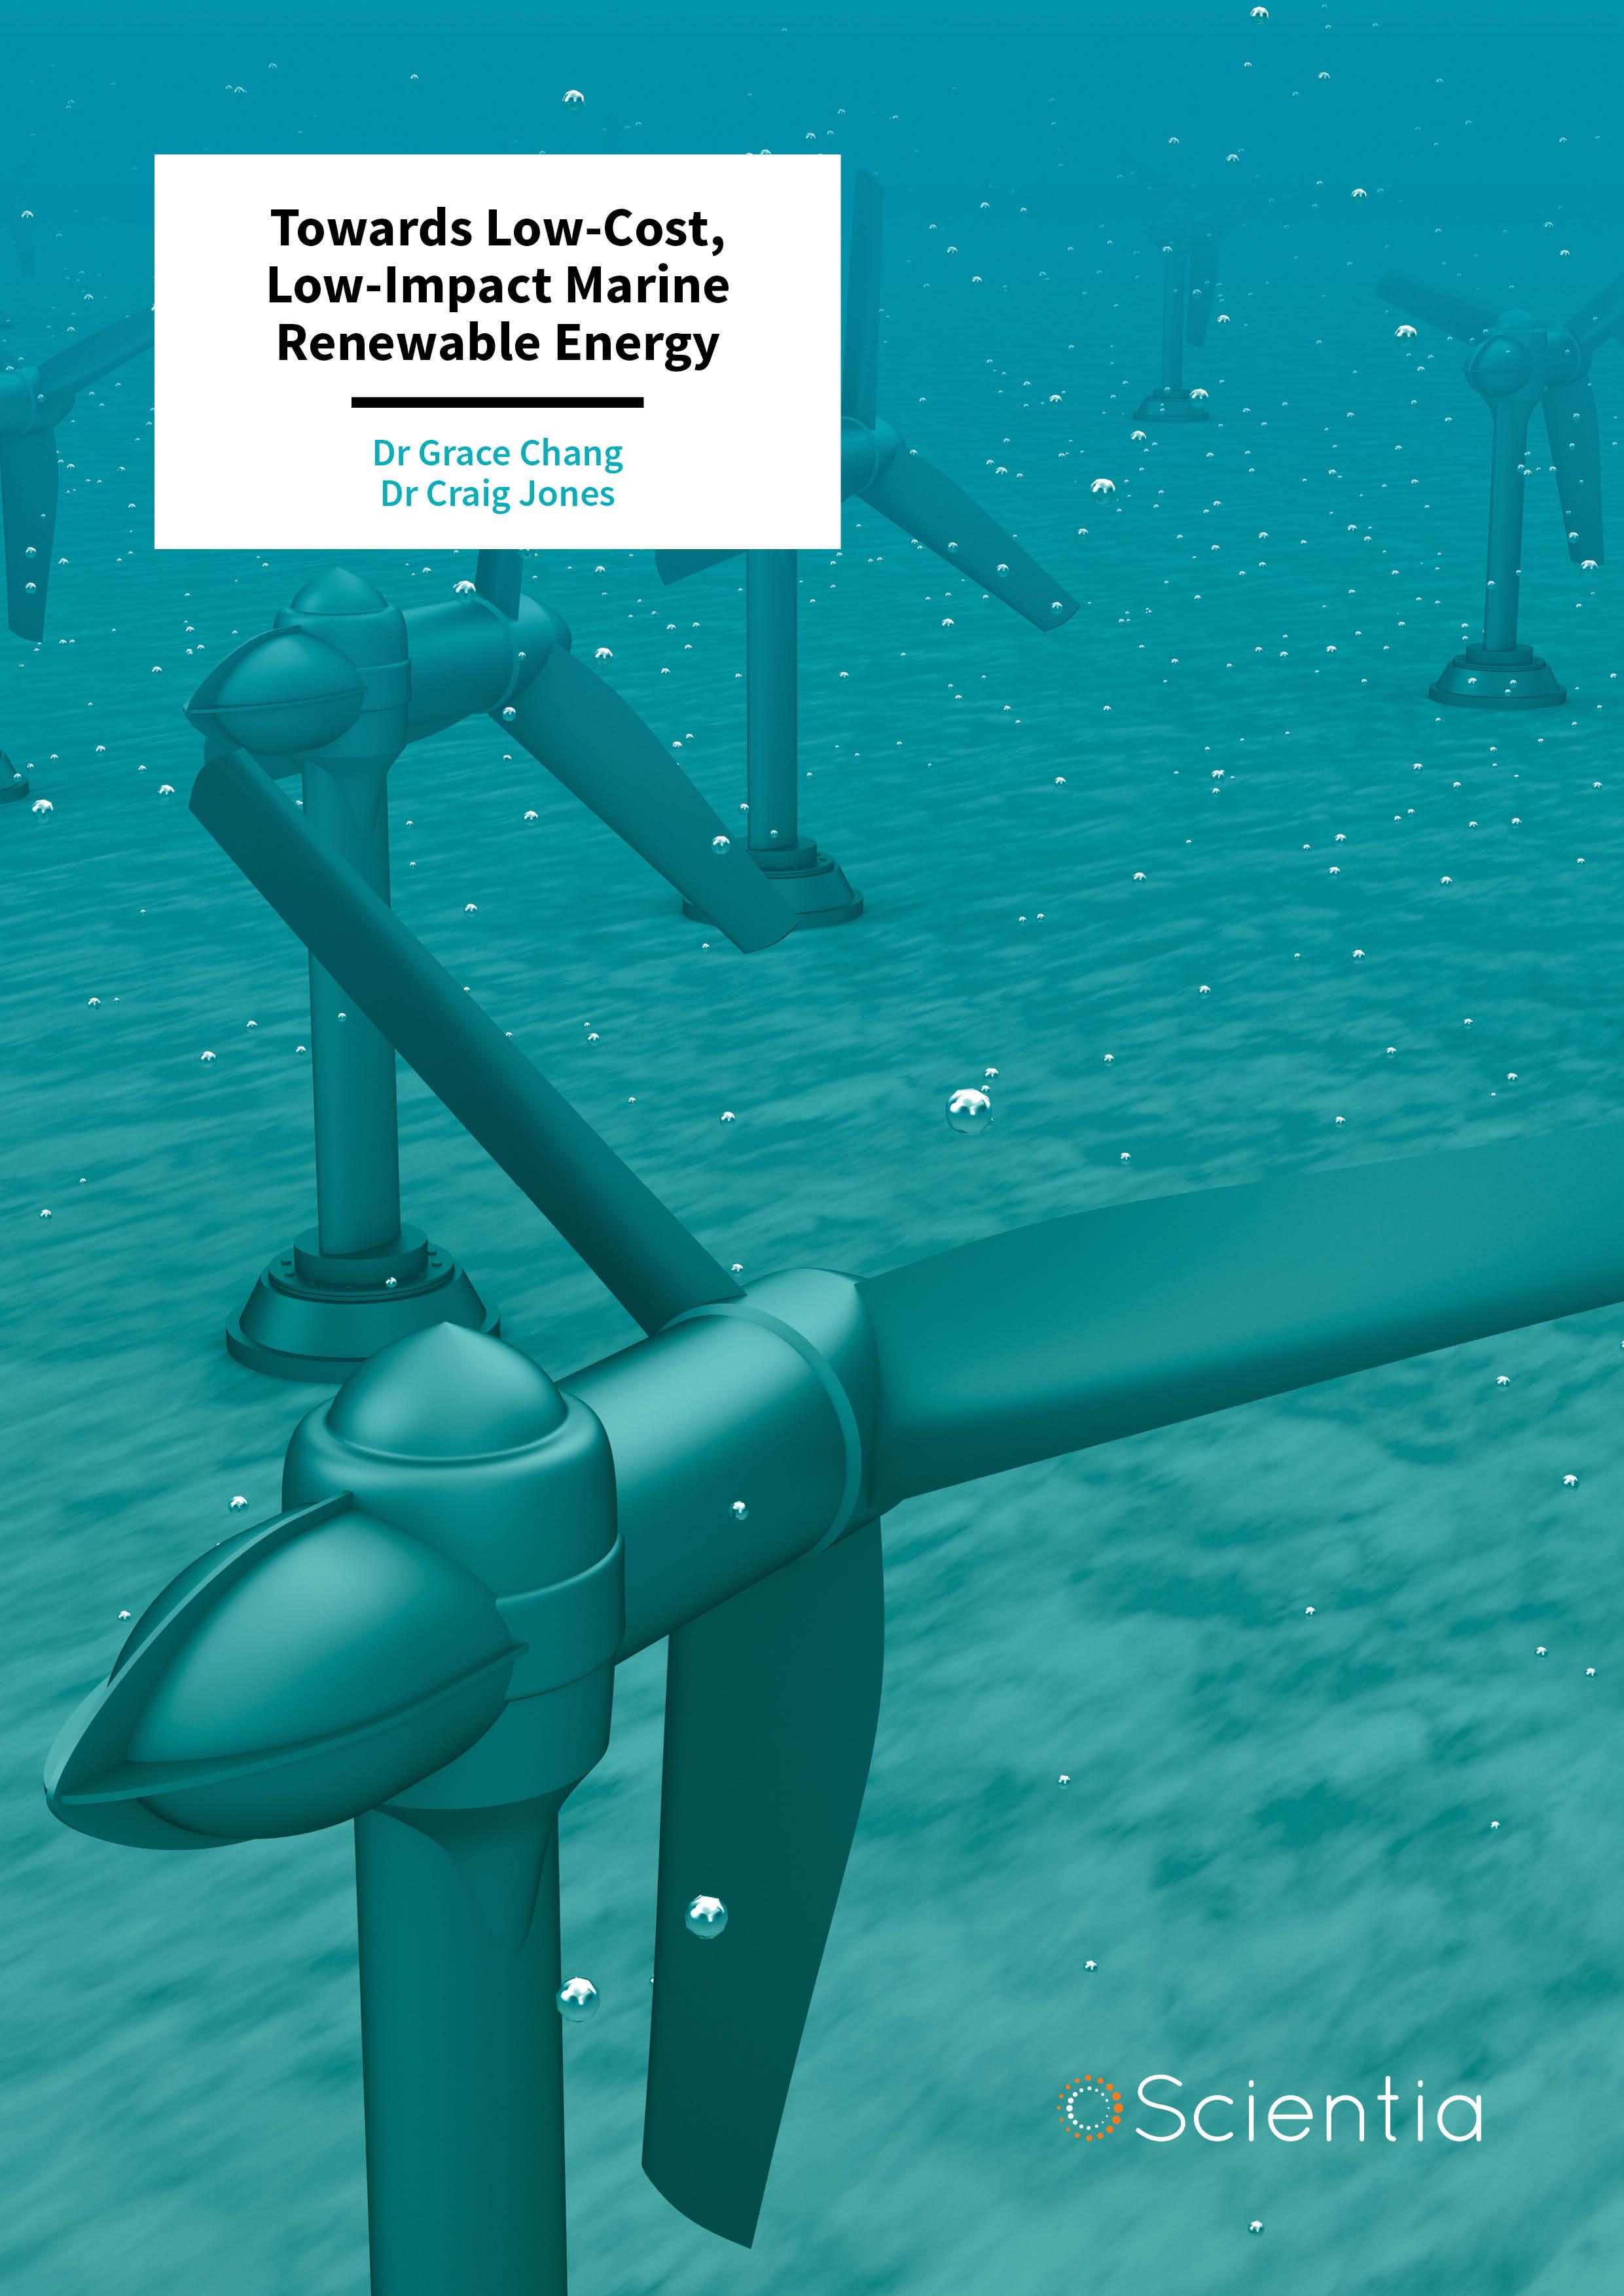 Dr Grace Chang | Dr Craig Jones  – Towards Low-Cost, Low-Impact Marine Renewable Energy